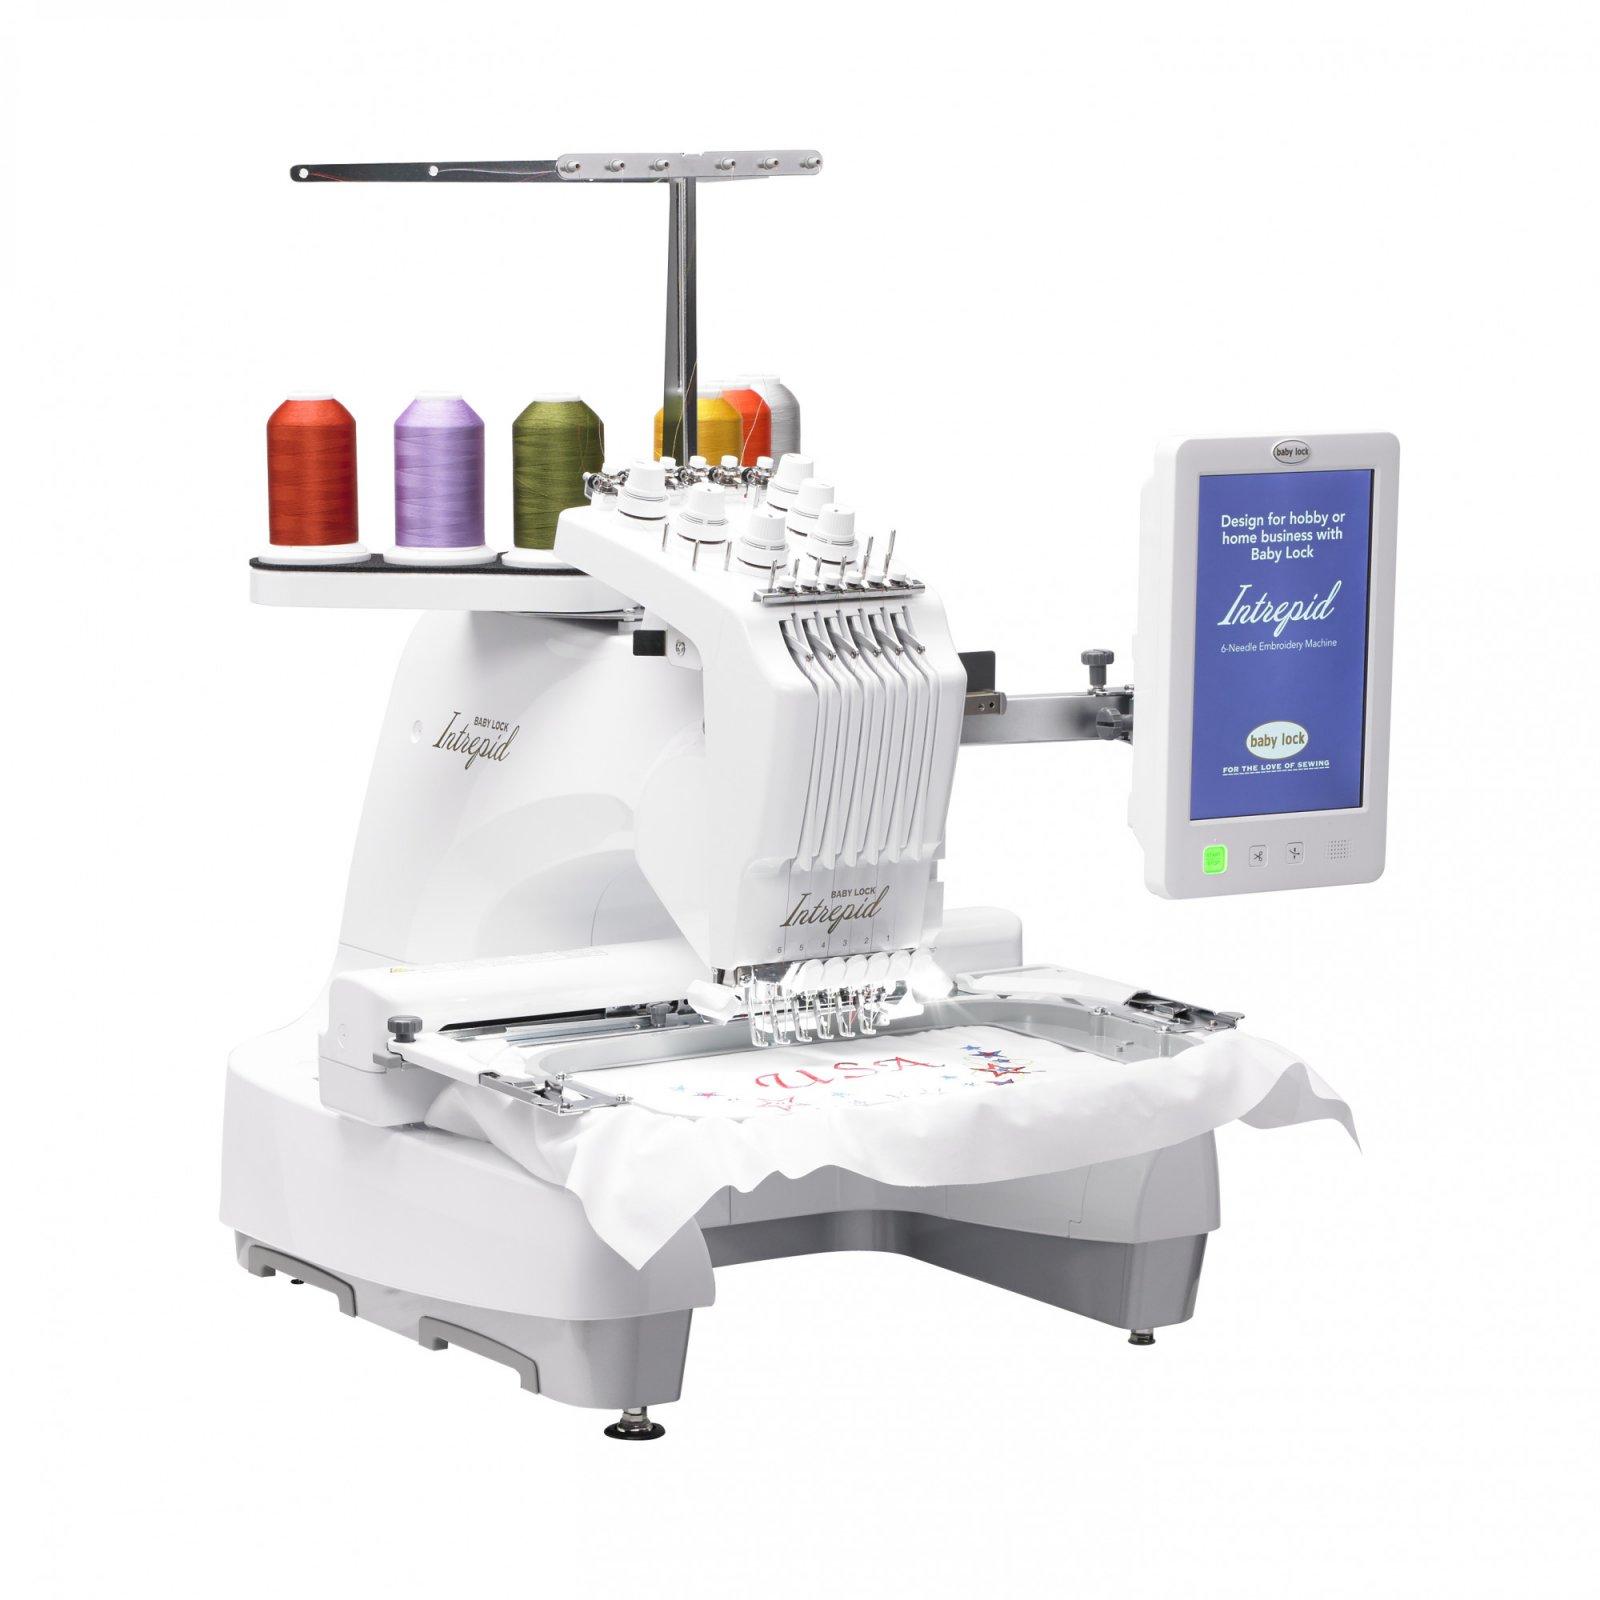 Babylock Intrepid 6 Needle Embroidery Machine